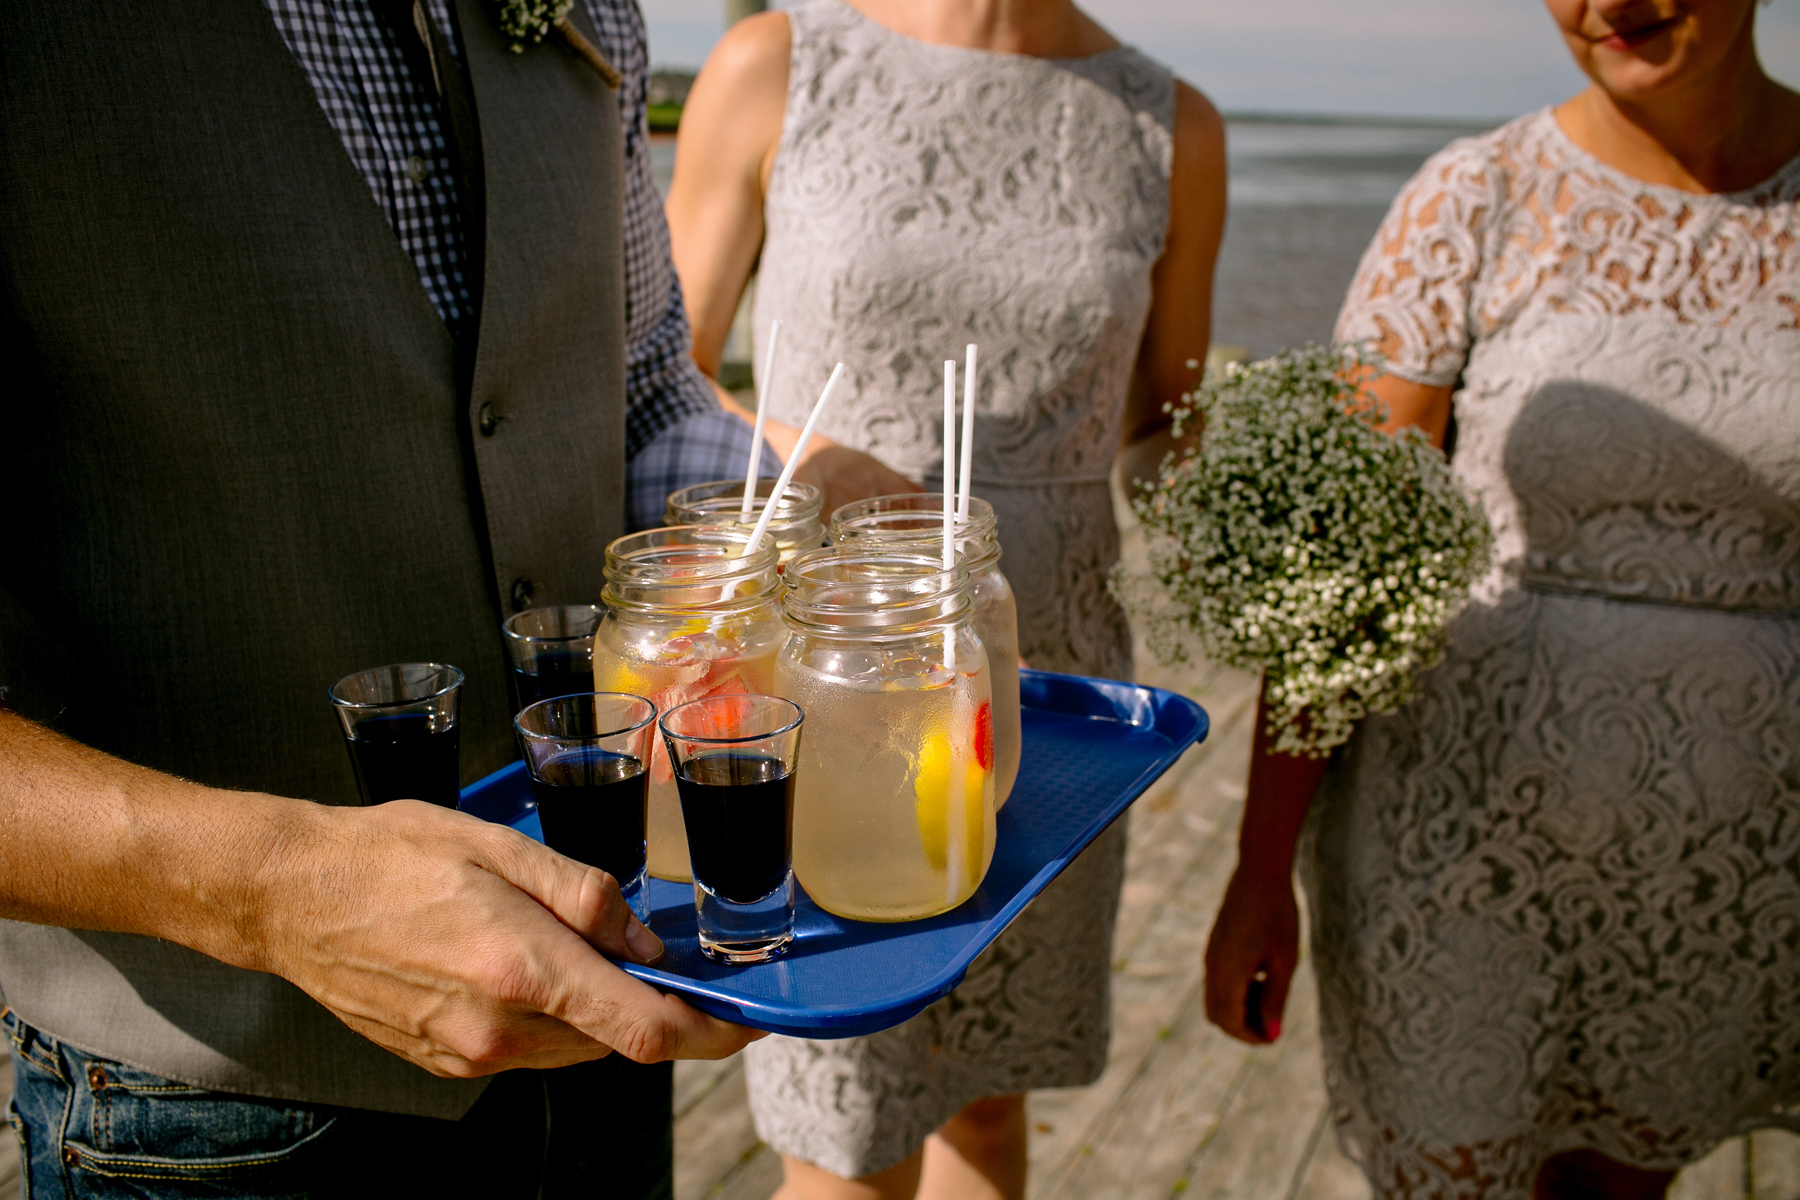 031-awesome-pei-wedding-photography-kandisebrown